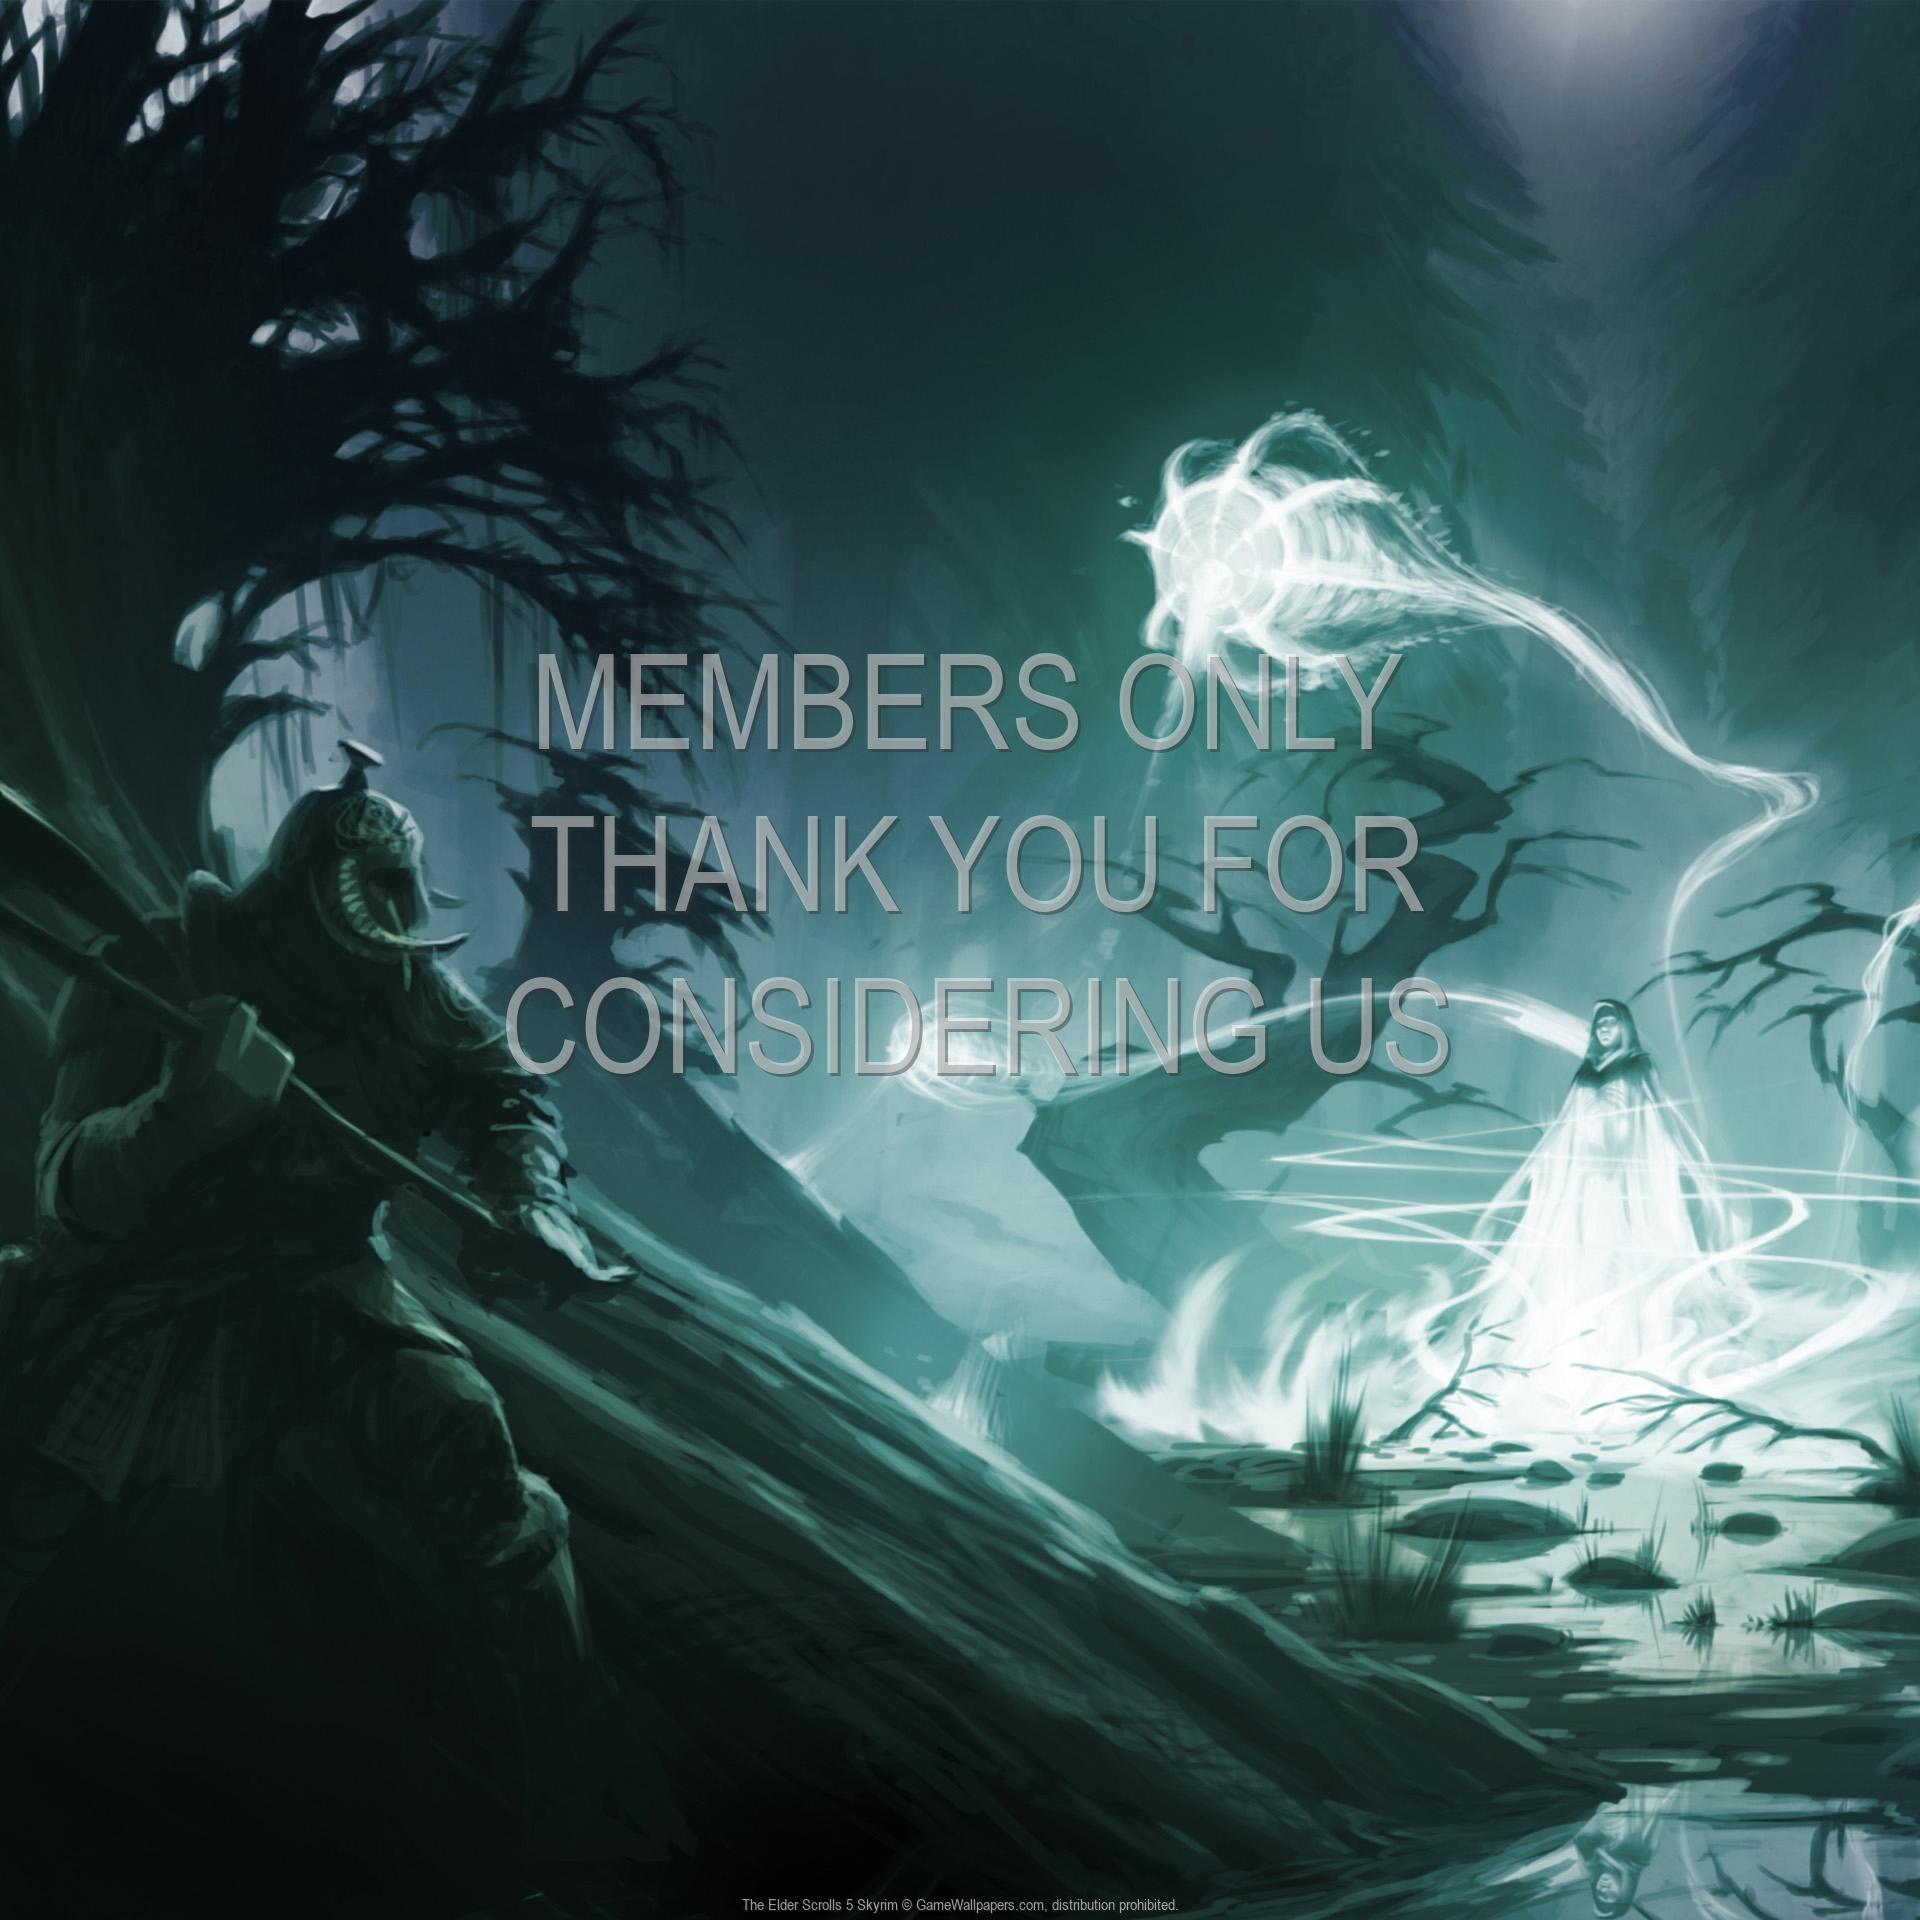 The Elder Scrolls 5: Skyrim 1920x1080 Handy Hintergrundbild 06